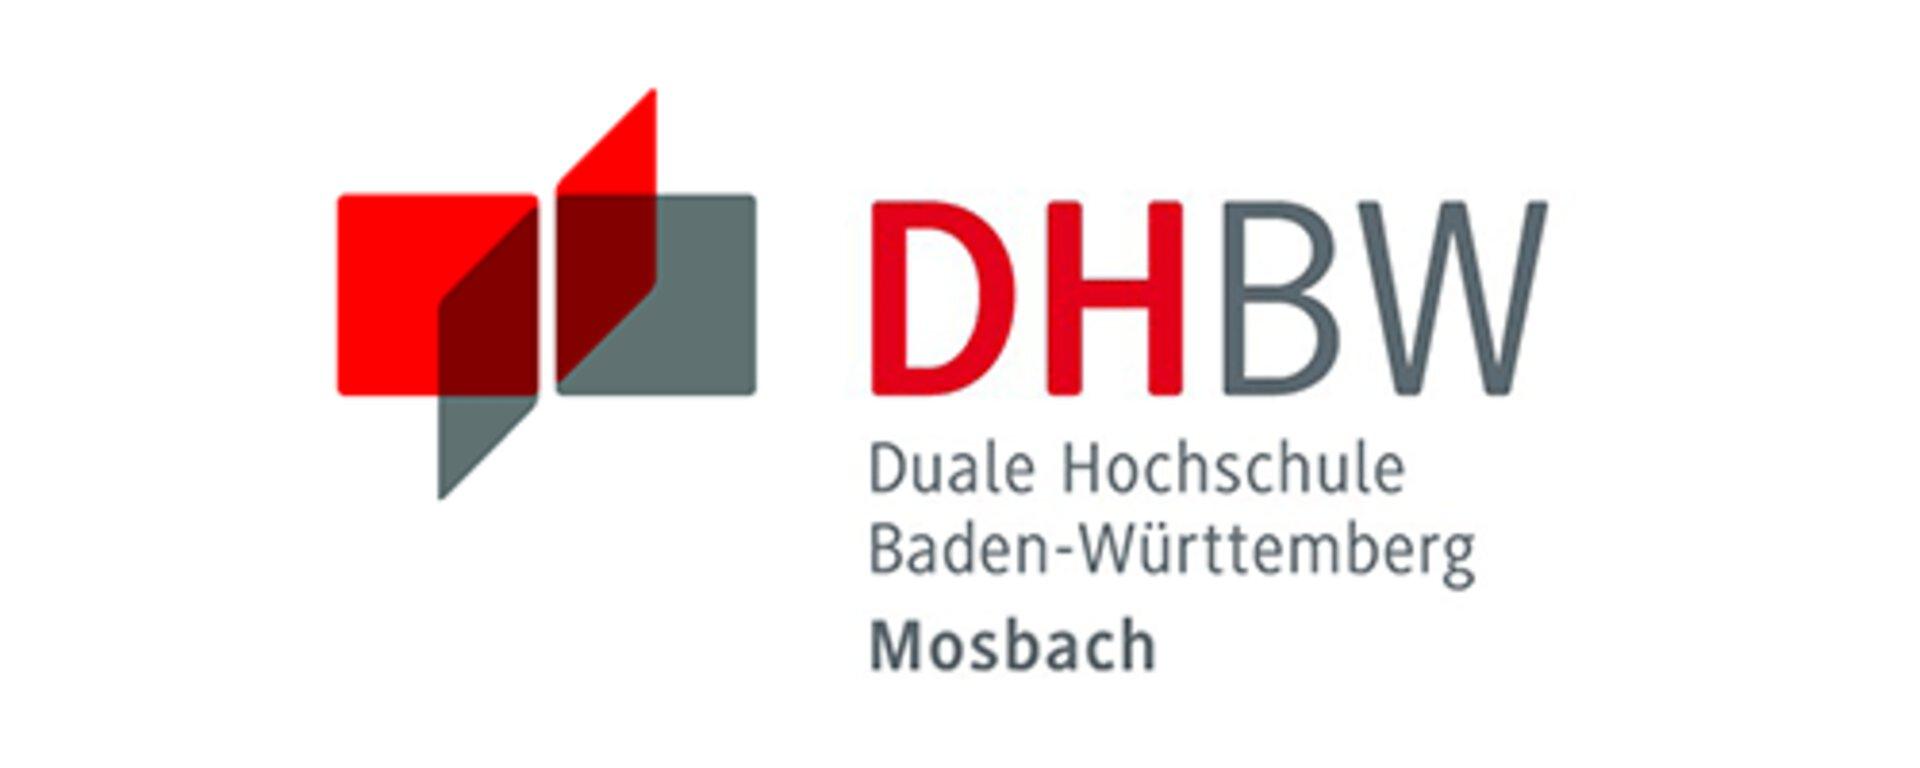 LOGO der DHBW - Duale Hochschule Baden-Württemberg